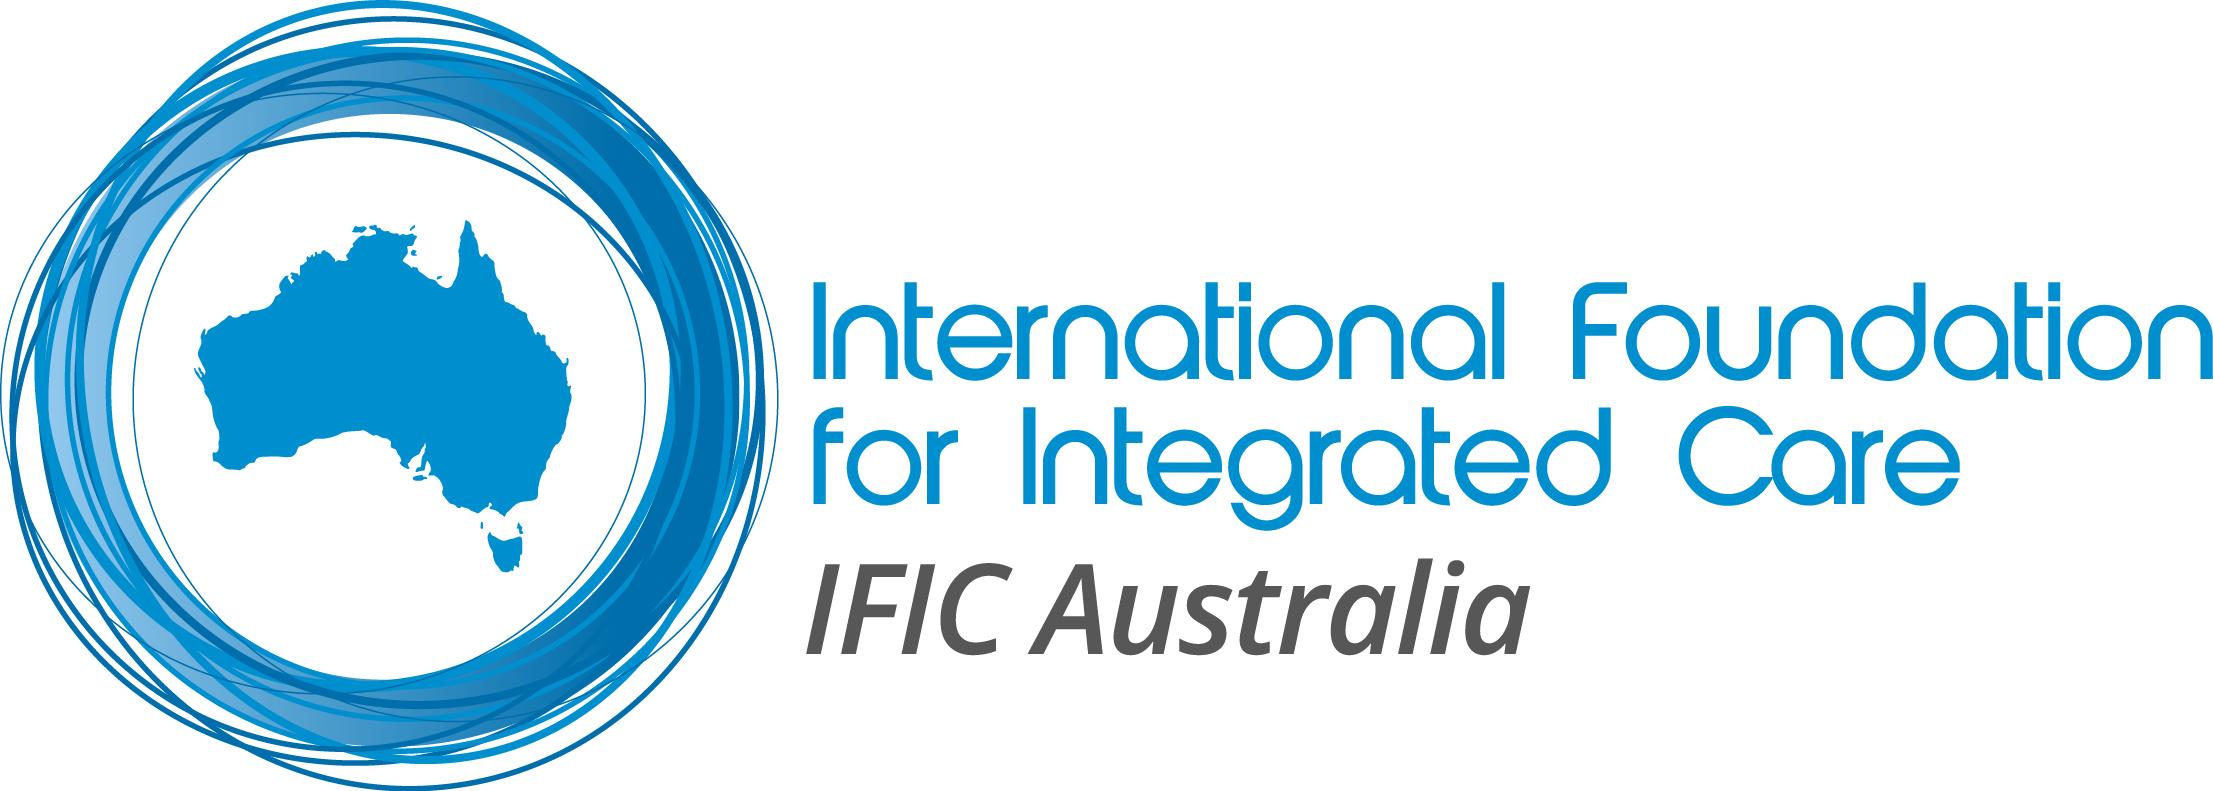 IFIC Australia Webinar Series 2020